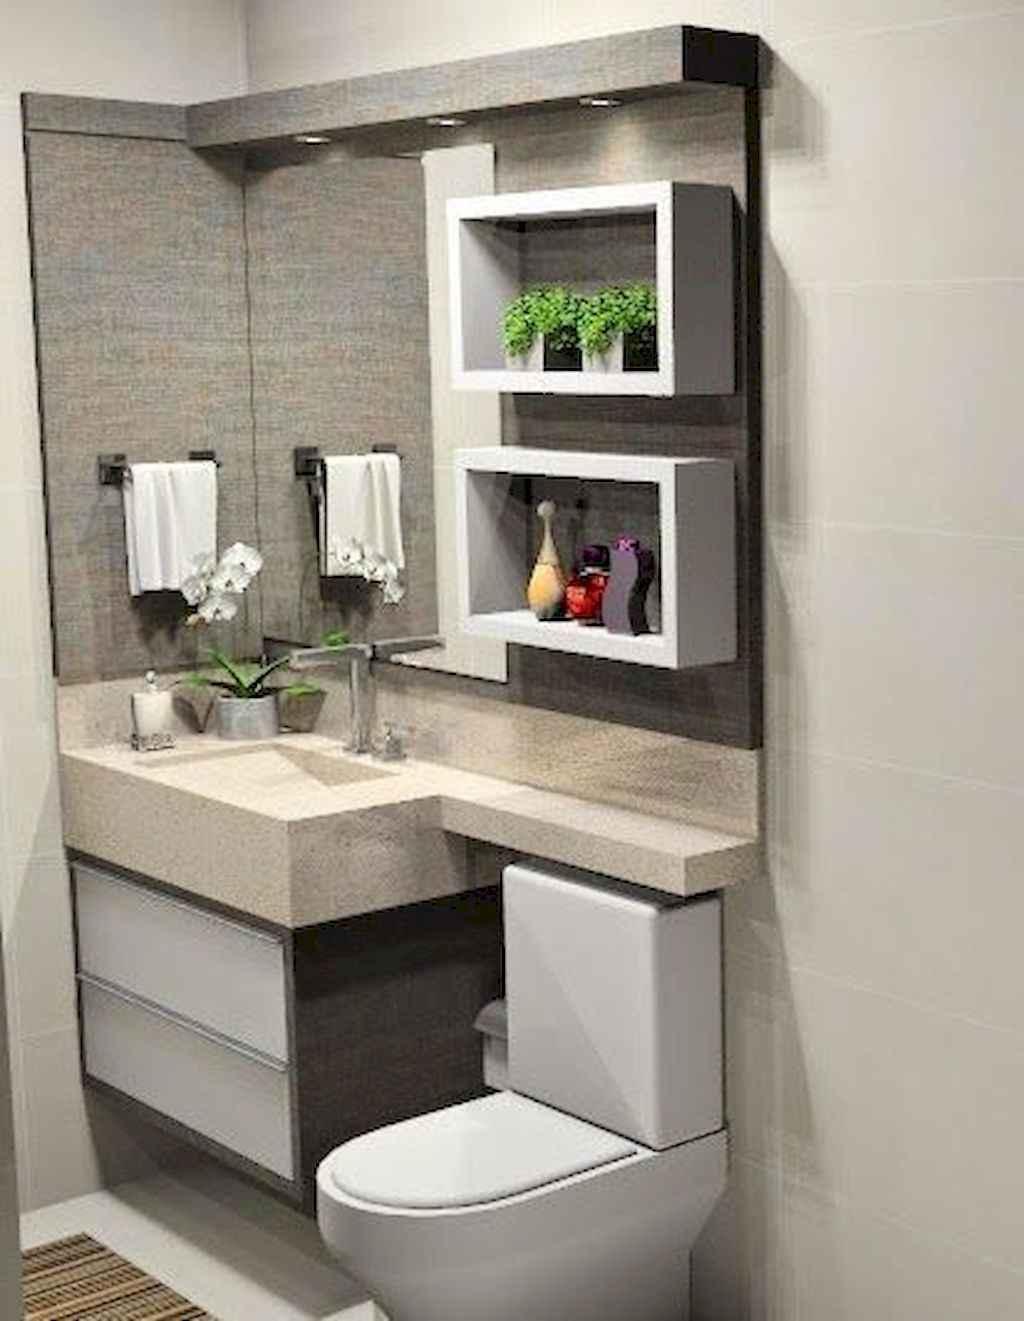 111 Brilliant Small Bathroom Remodel Ideas On A Budget (27)